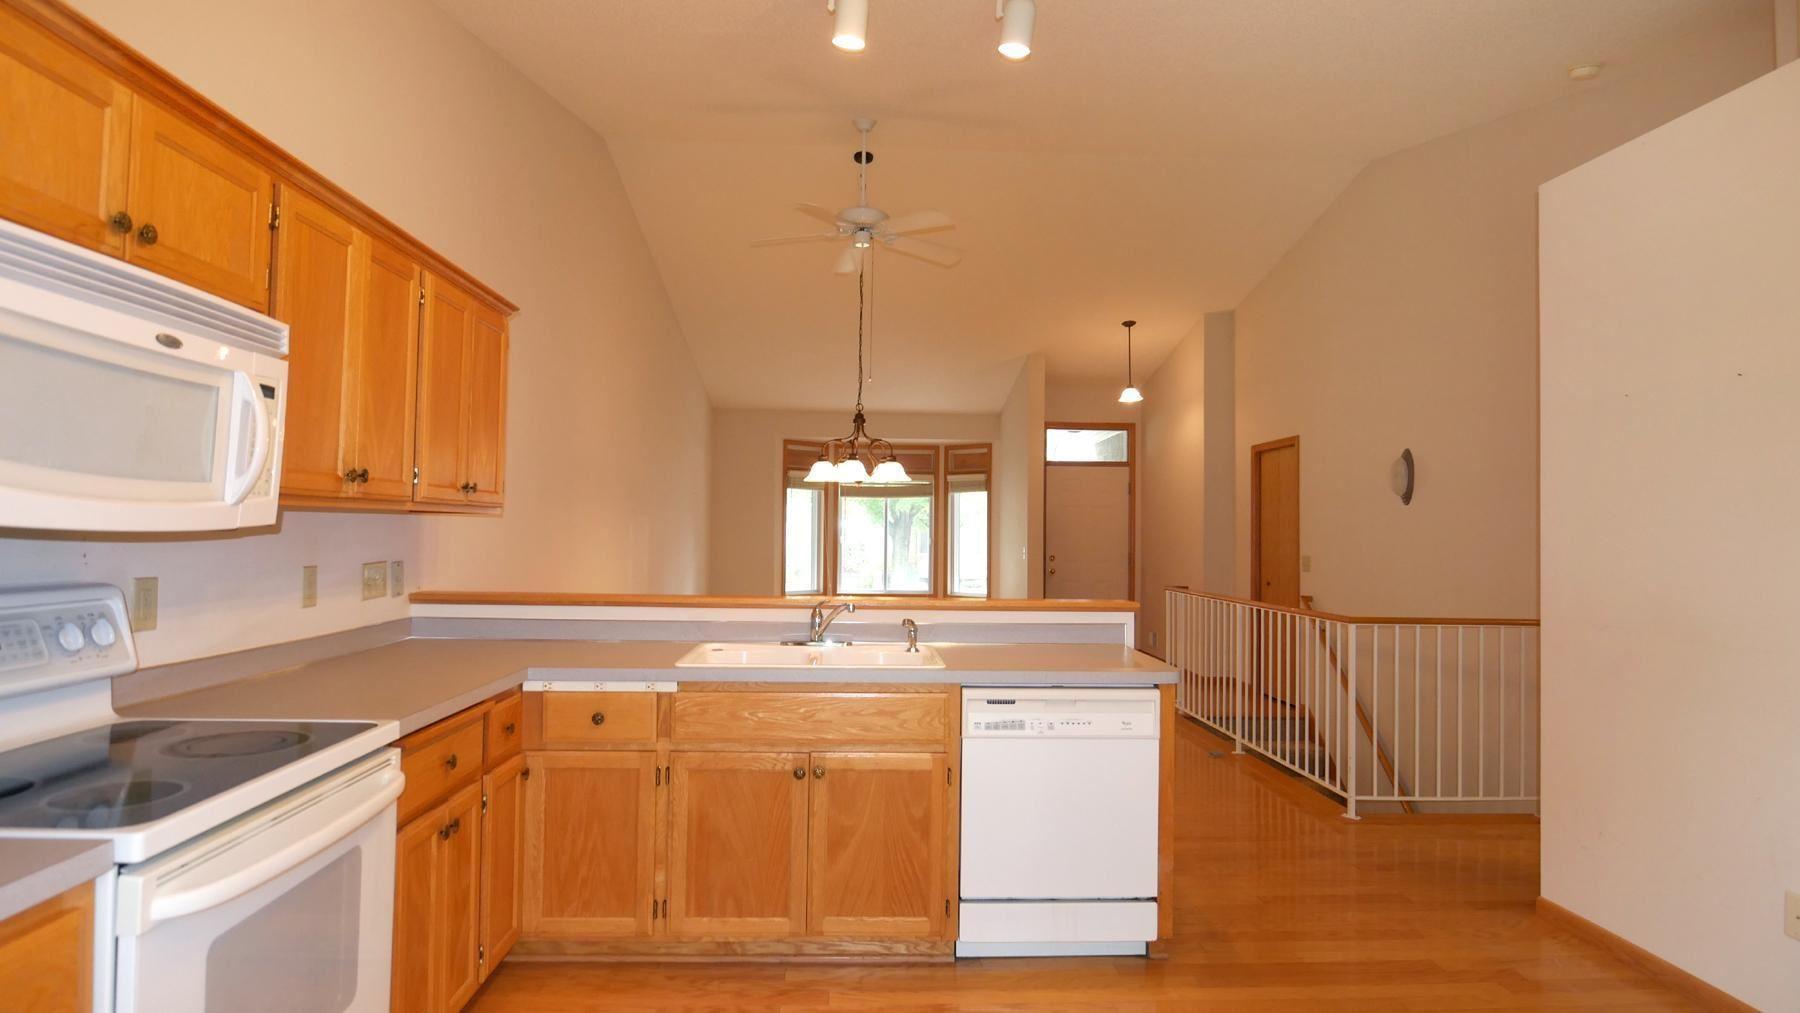 13310 Glenhaven Court, Apple Valley, MN 55124 - MLS#: 6100754